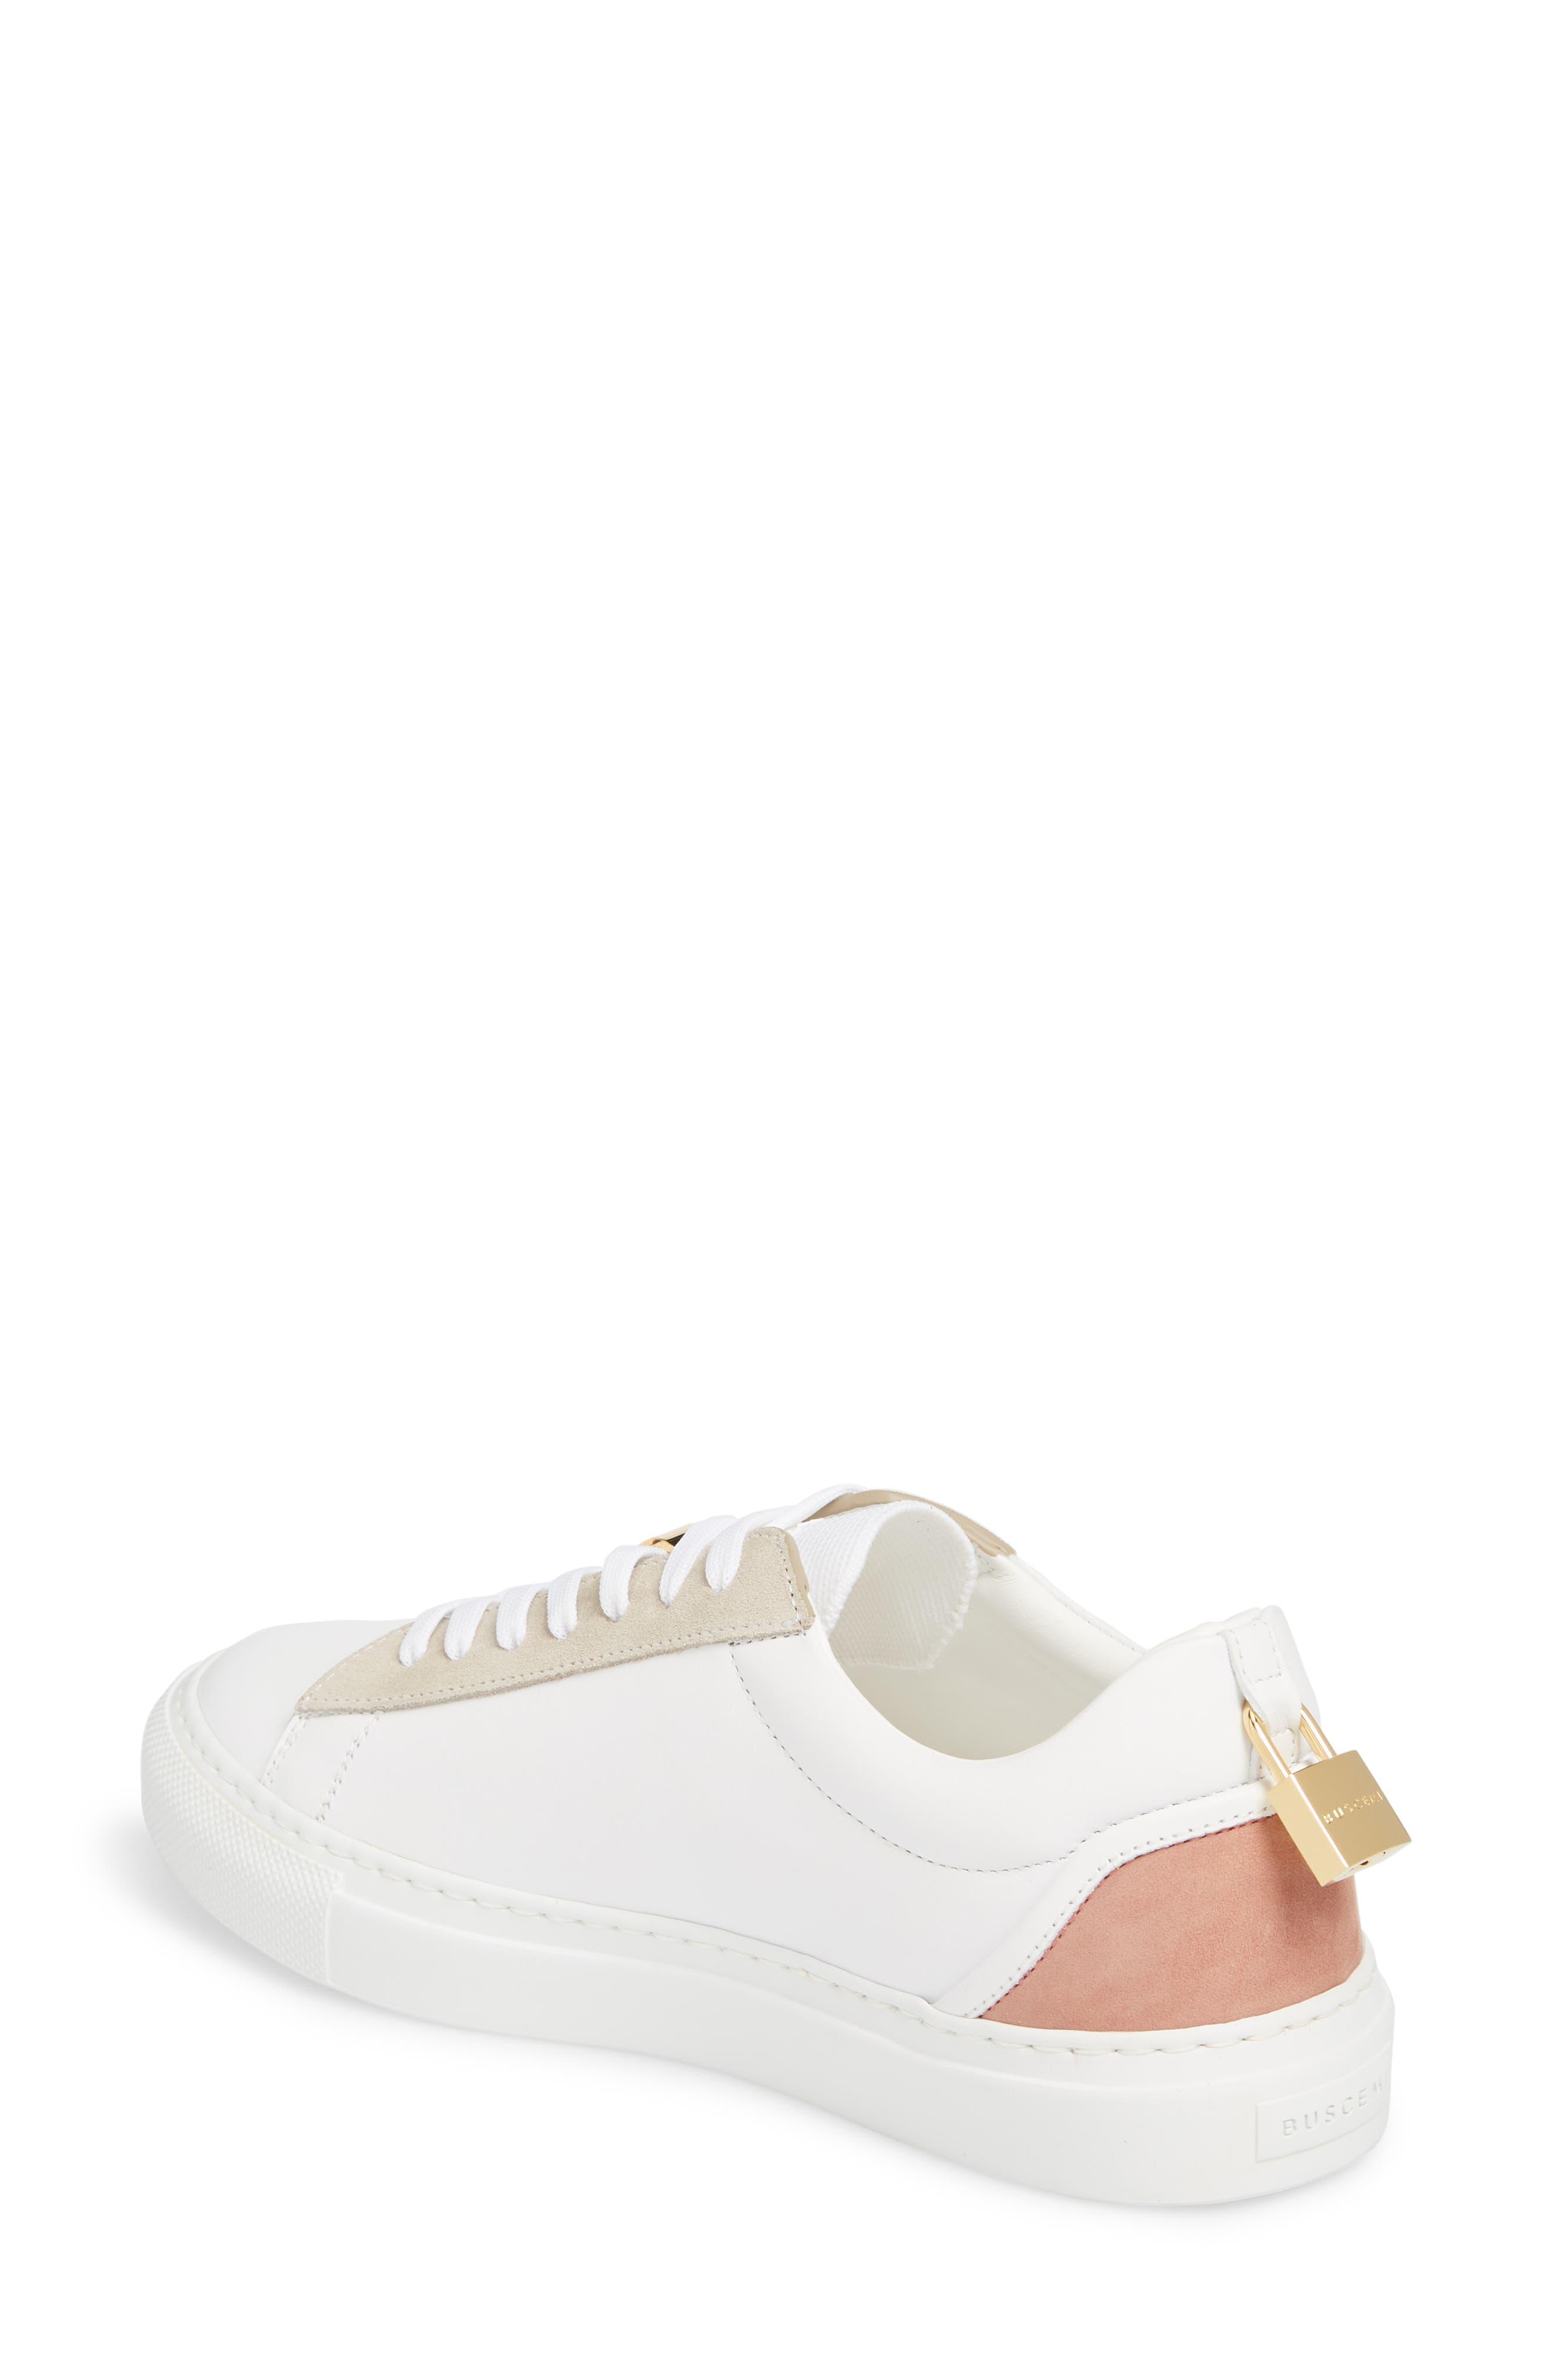 Tennis Lock Sneaker,                             Alternate thumbnail 2, color,                             White/ Dusty Pink